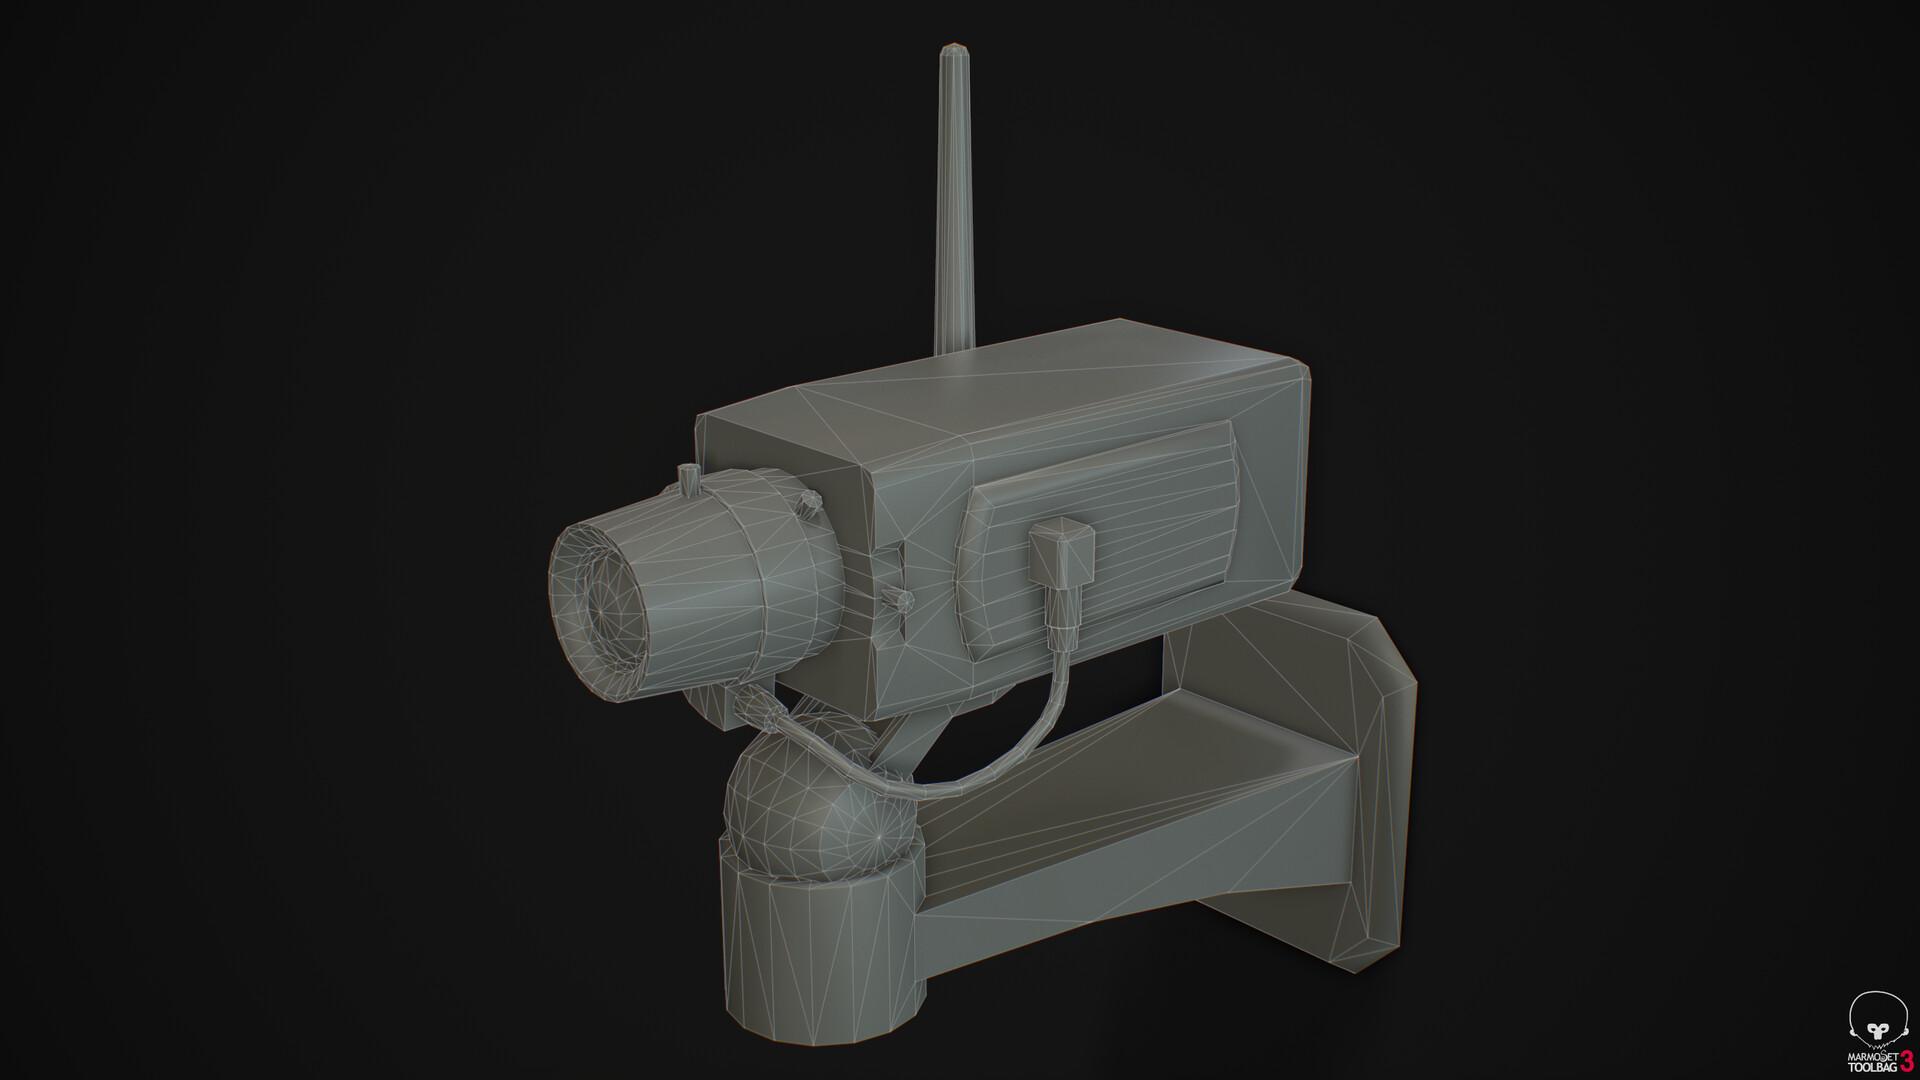 Camera A - Wireframe